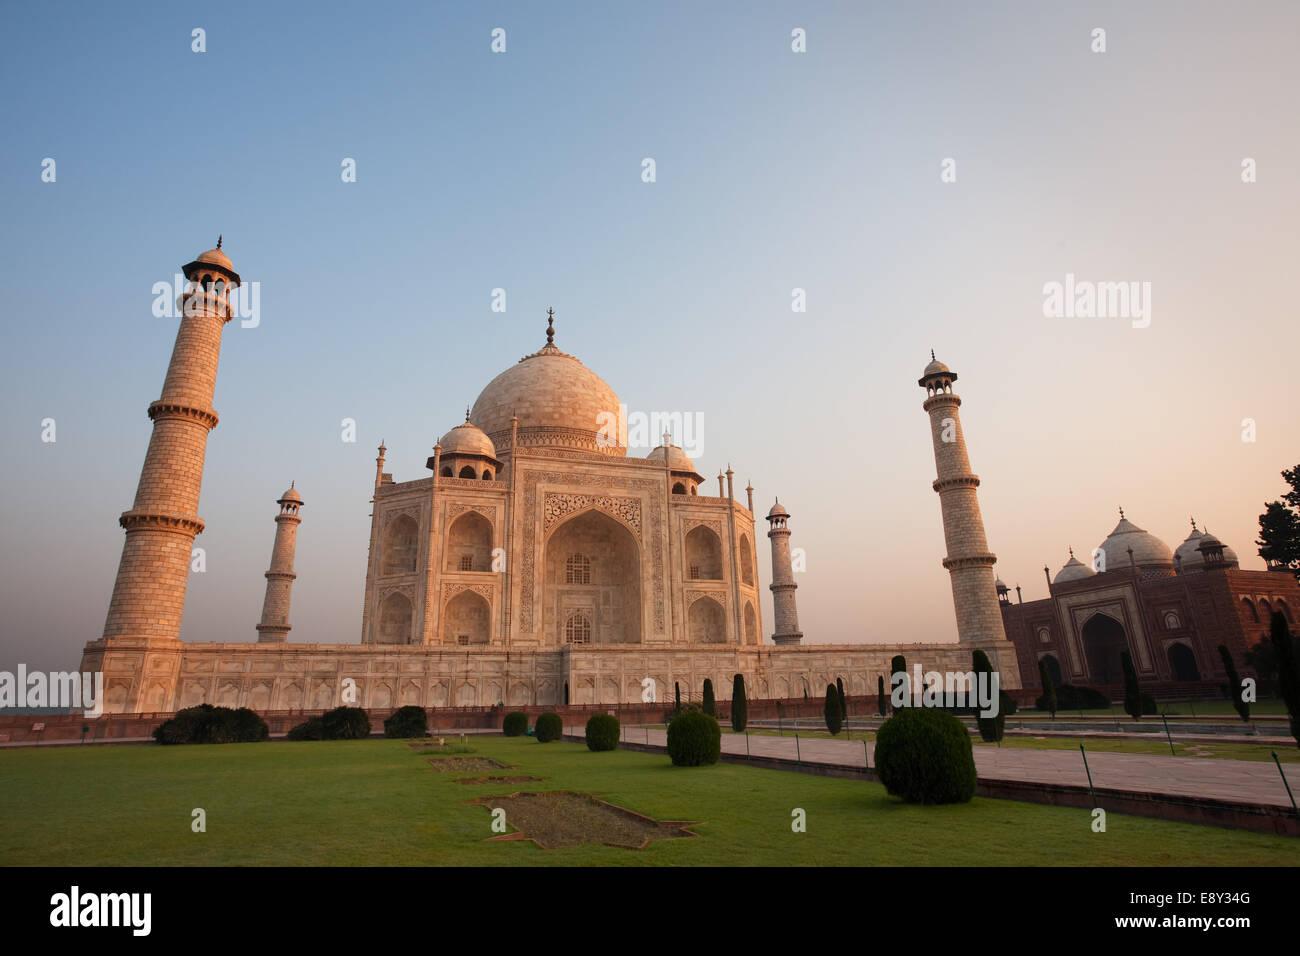 Empty Taj Mahal and Jawab at Sunrise - Stock Image